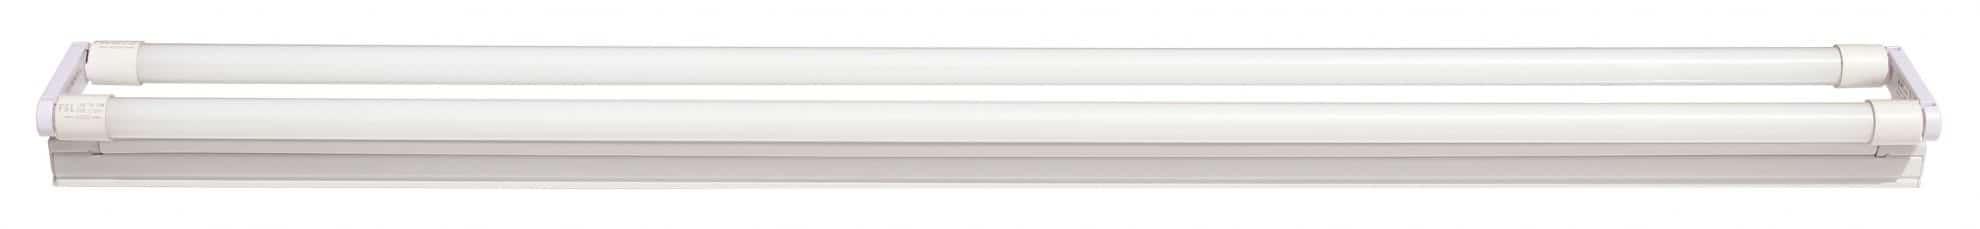 תאורת לד אמריקאי (פלורסנט) לבן FS-T8LG 2X18W-D ,FSL